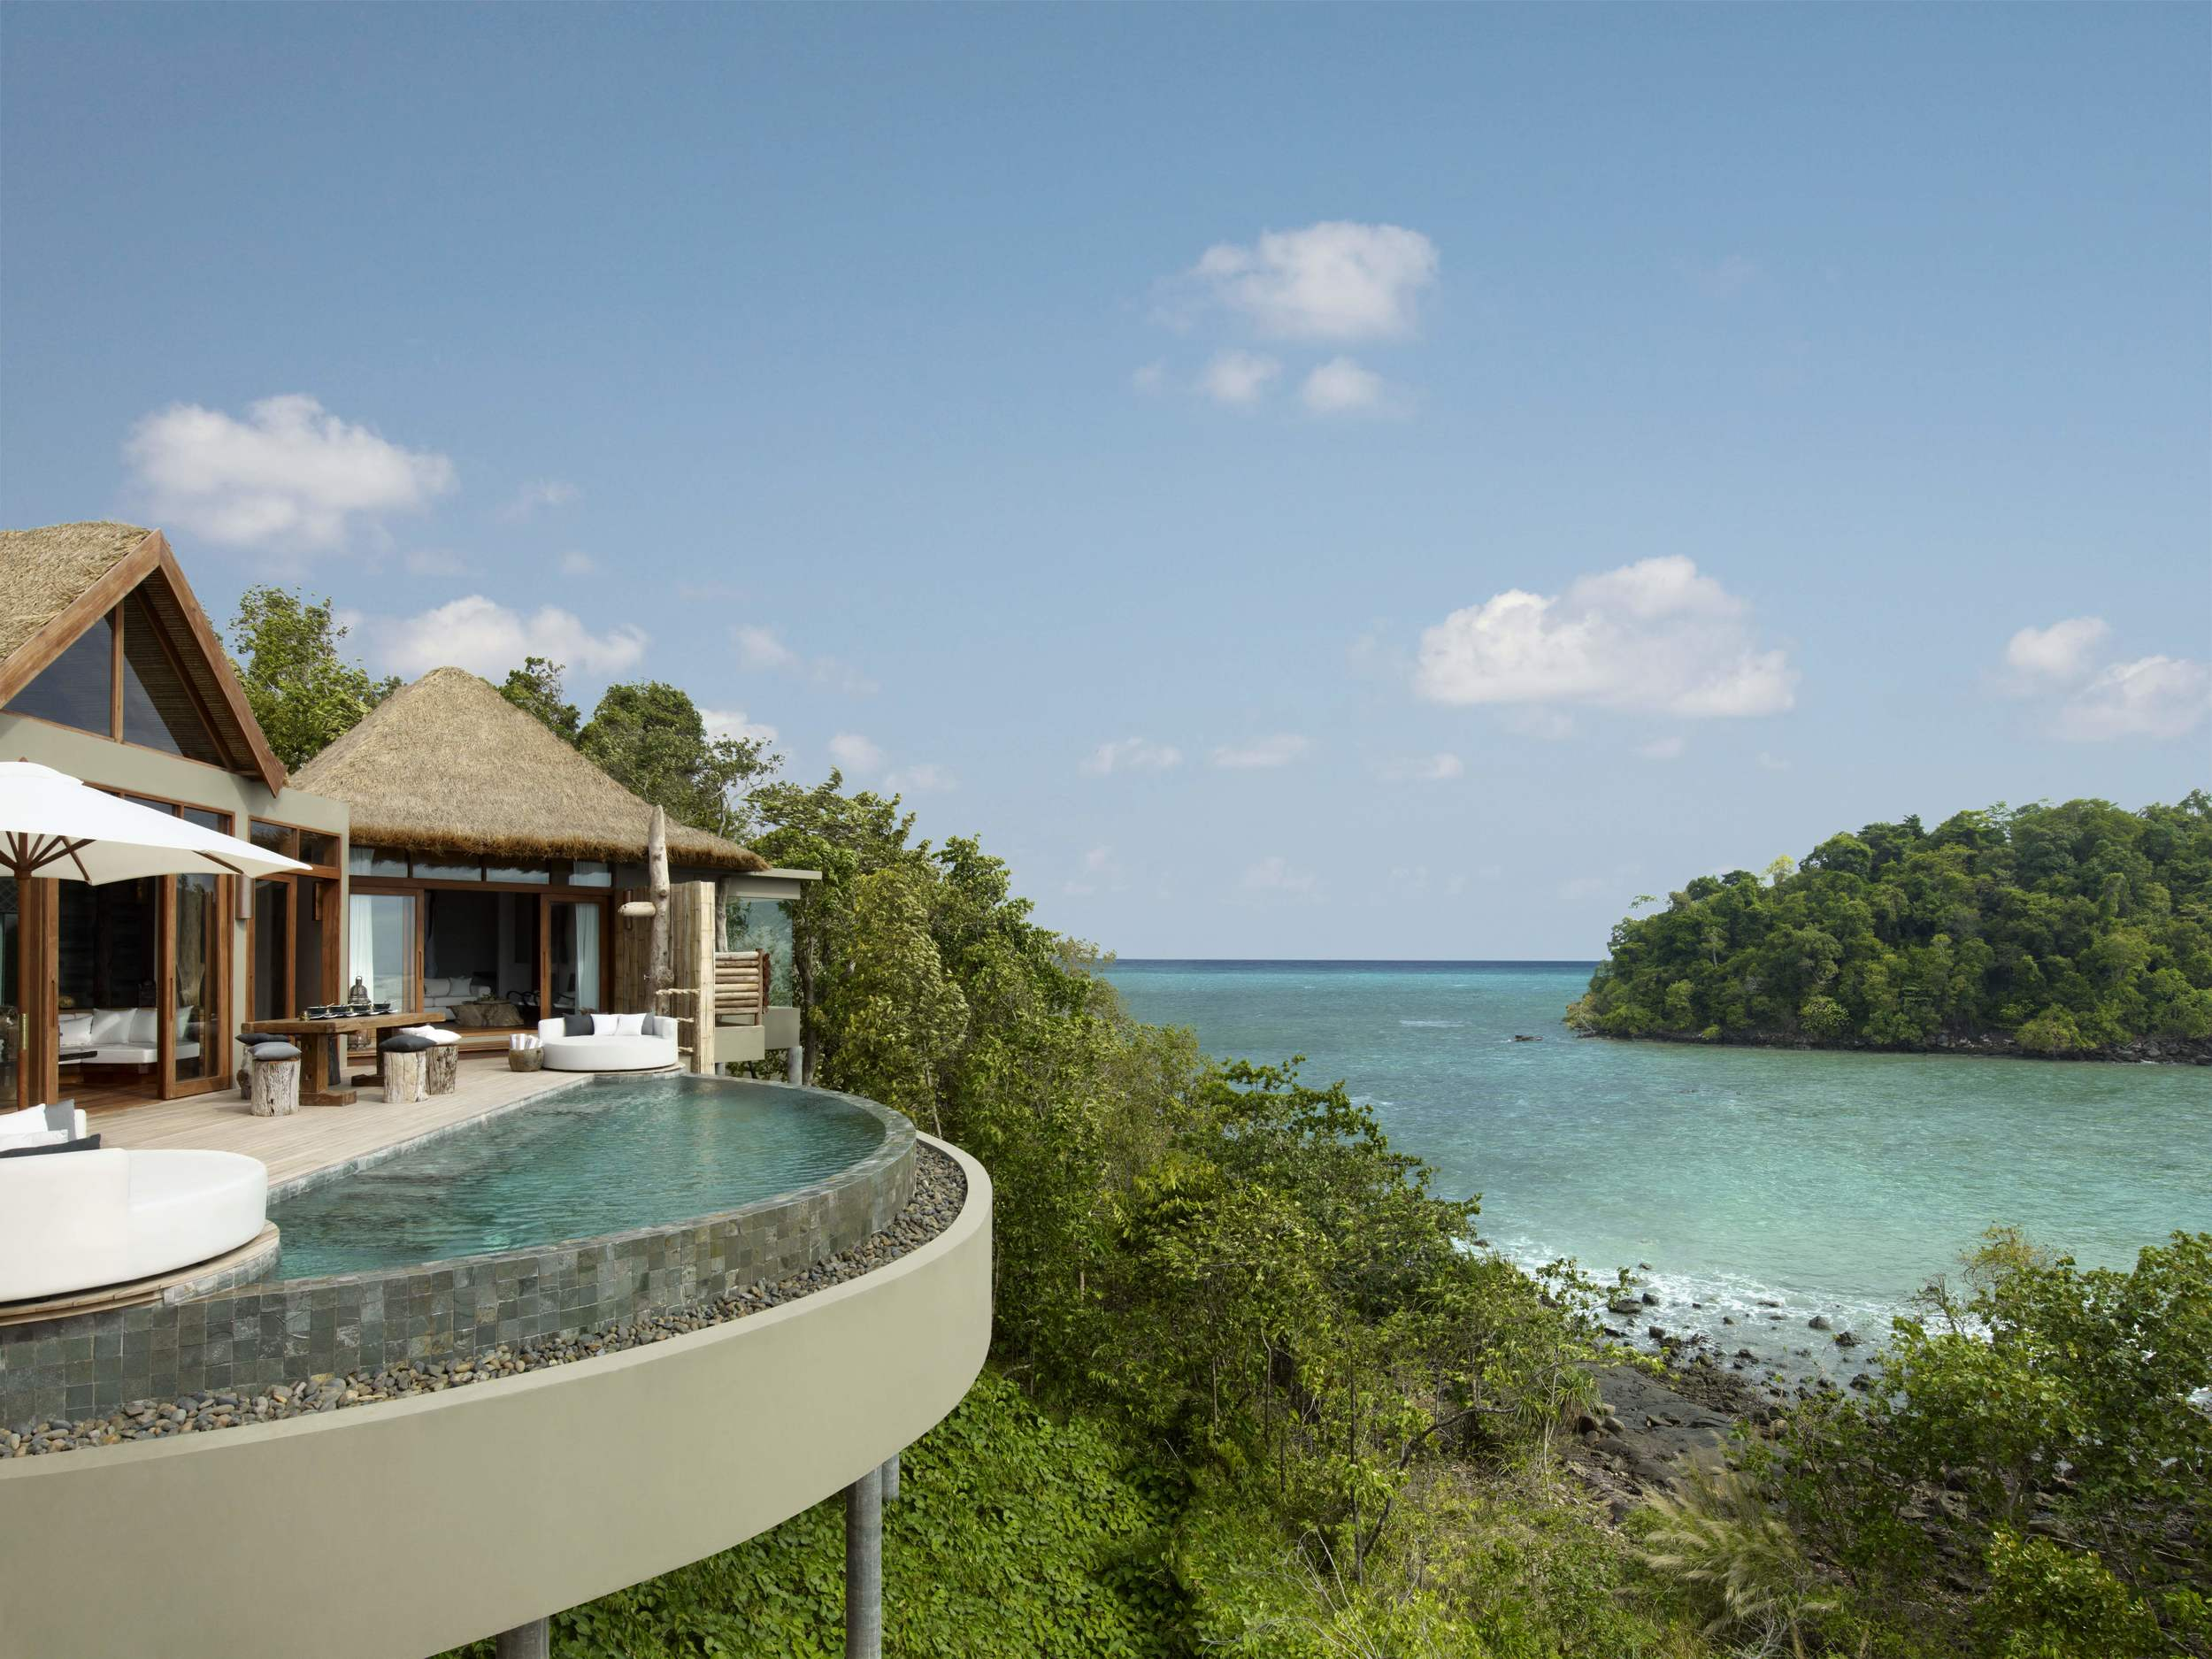 6.Song Saa Private Island-Here & Away.jpg